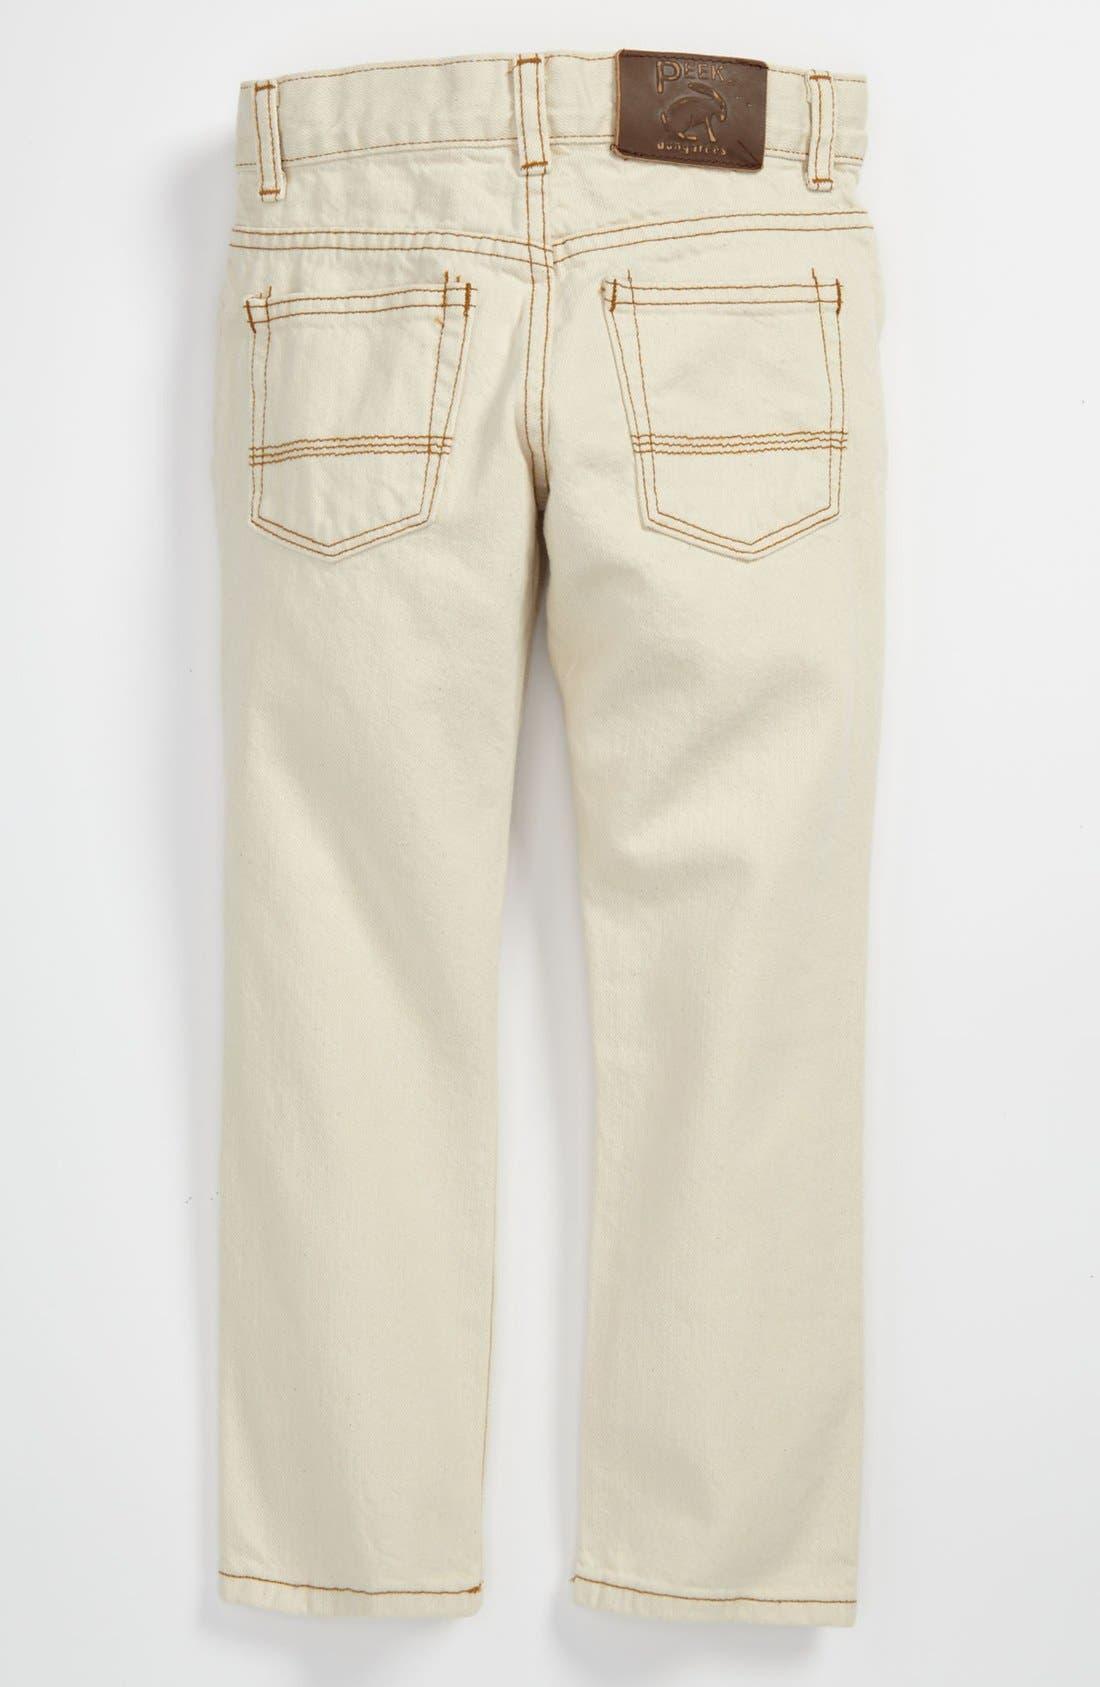 Main Image - Peek 'Slouch' Jeans (Toddler, Little Boys & Big Boys)